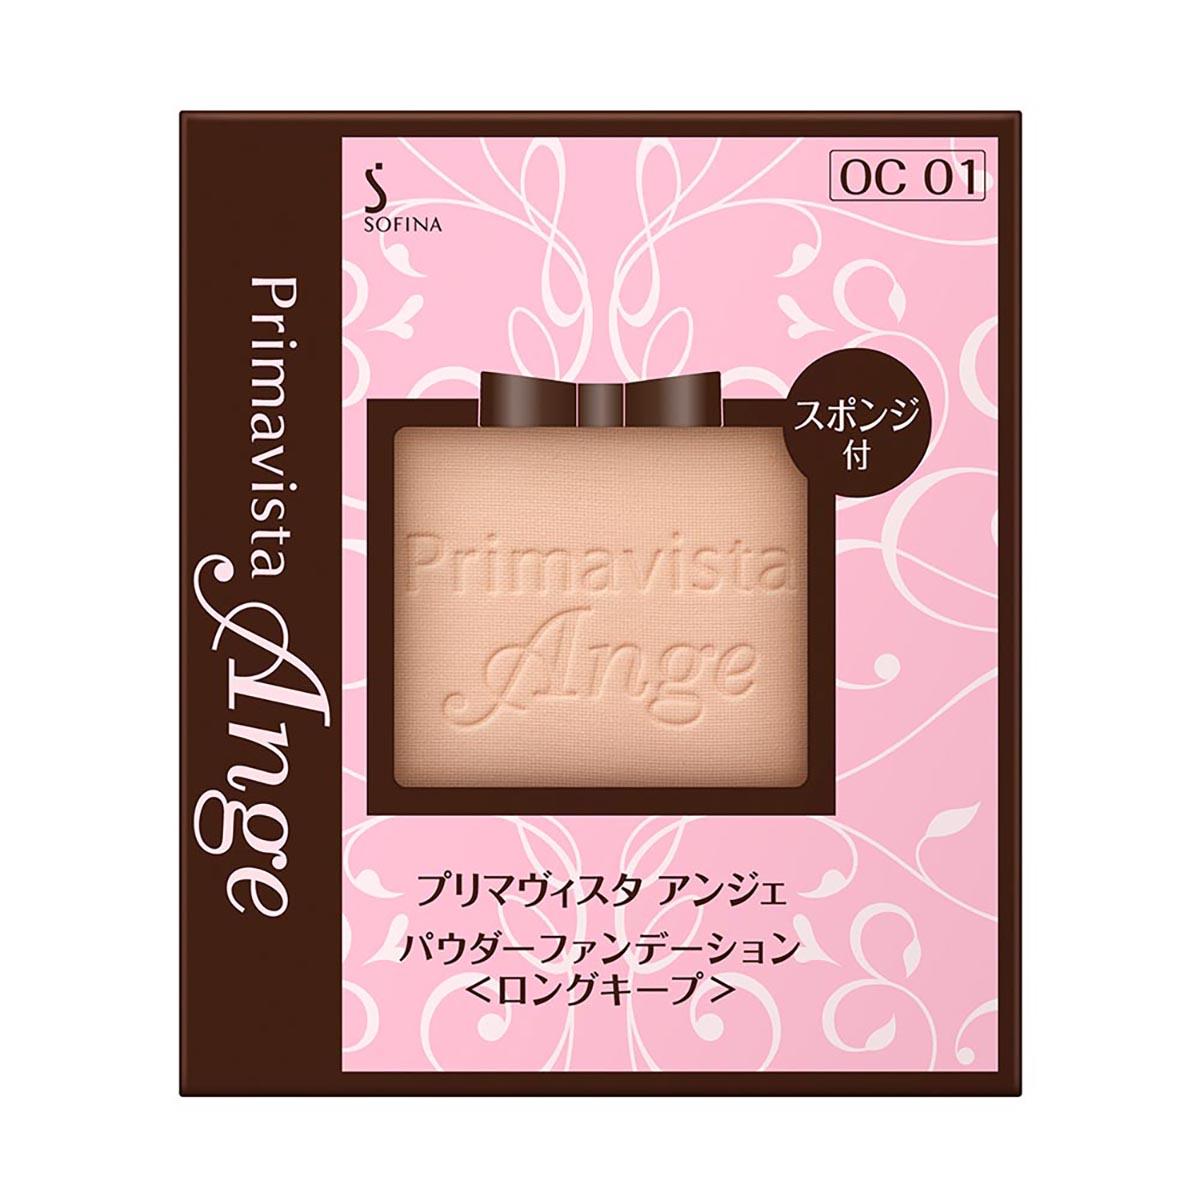 SOFINA蘇菲娜 漾緁輕妝綺肌長效粉餅OC01 9.7g 【康是美】